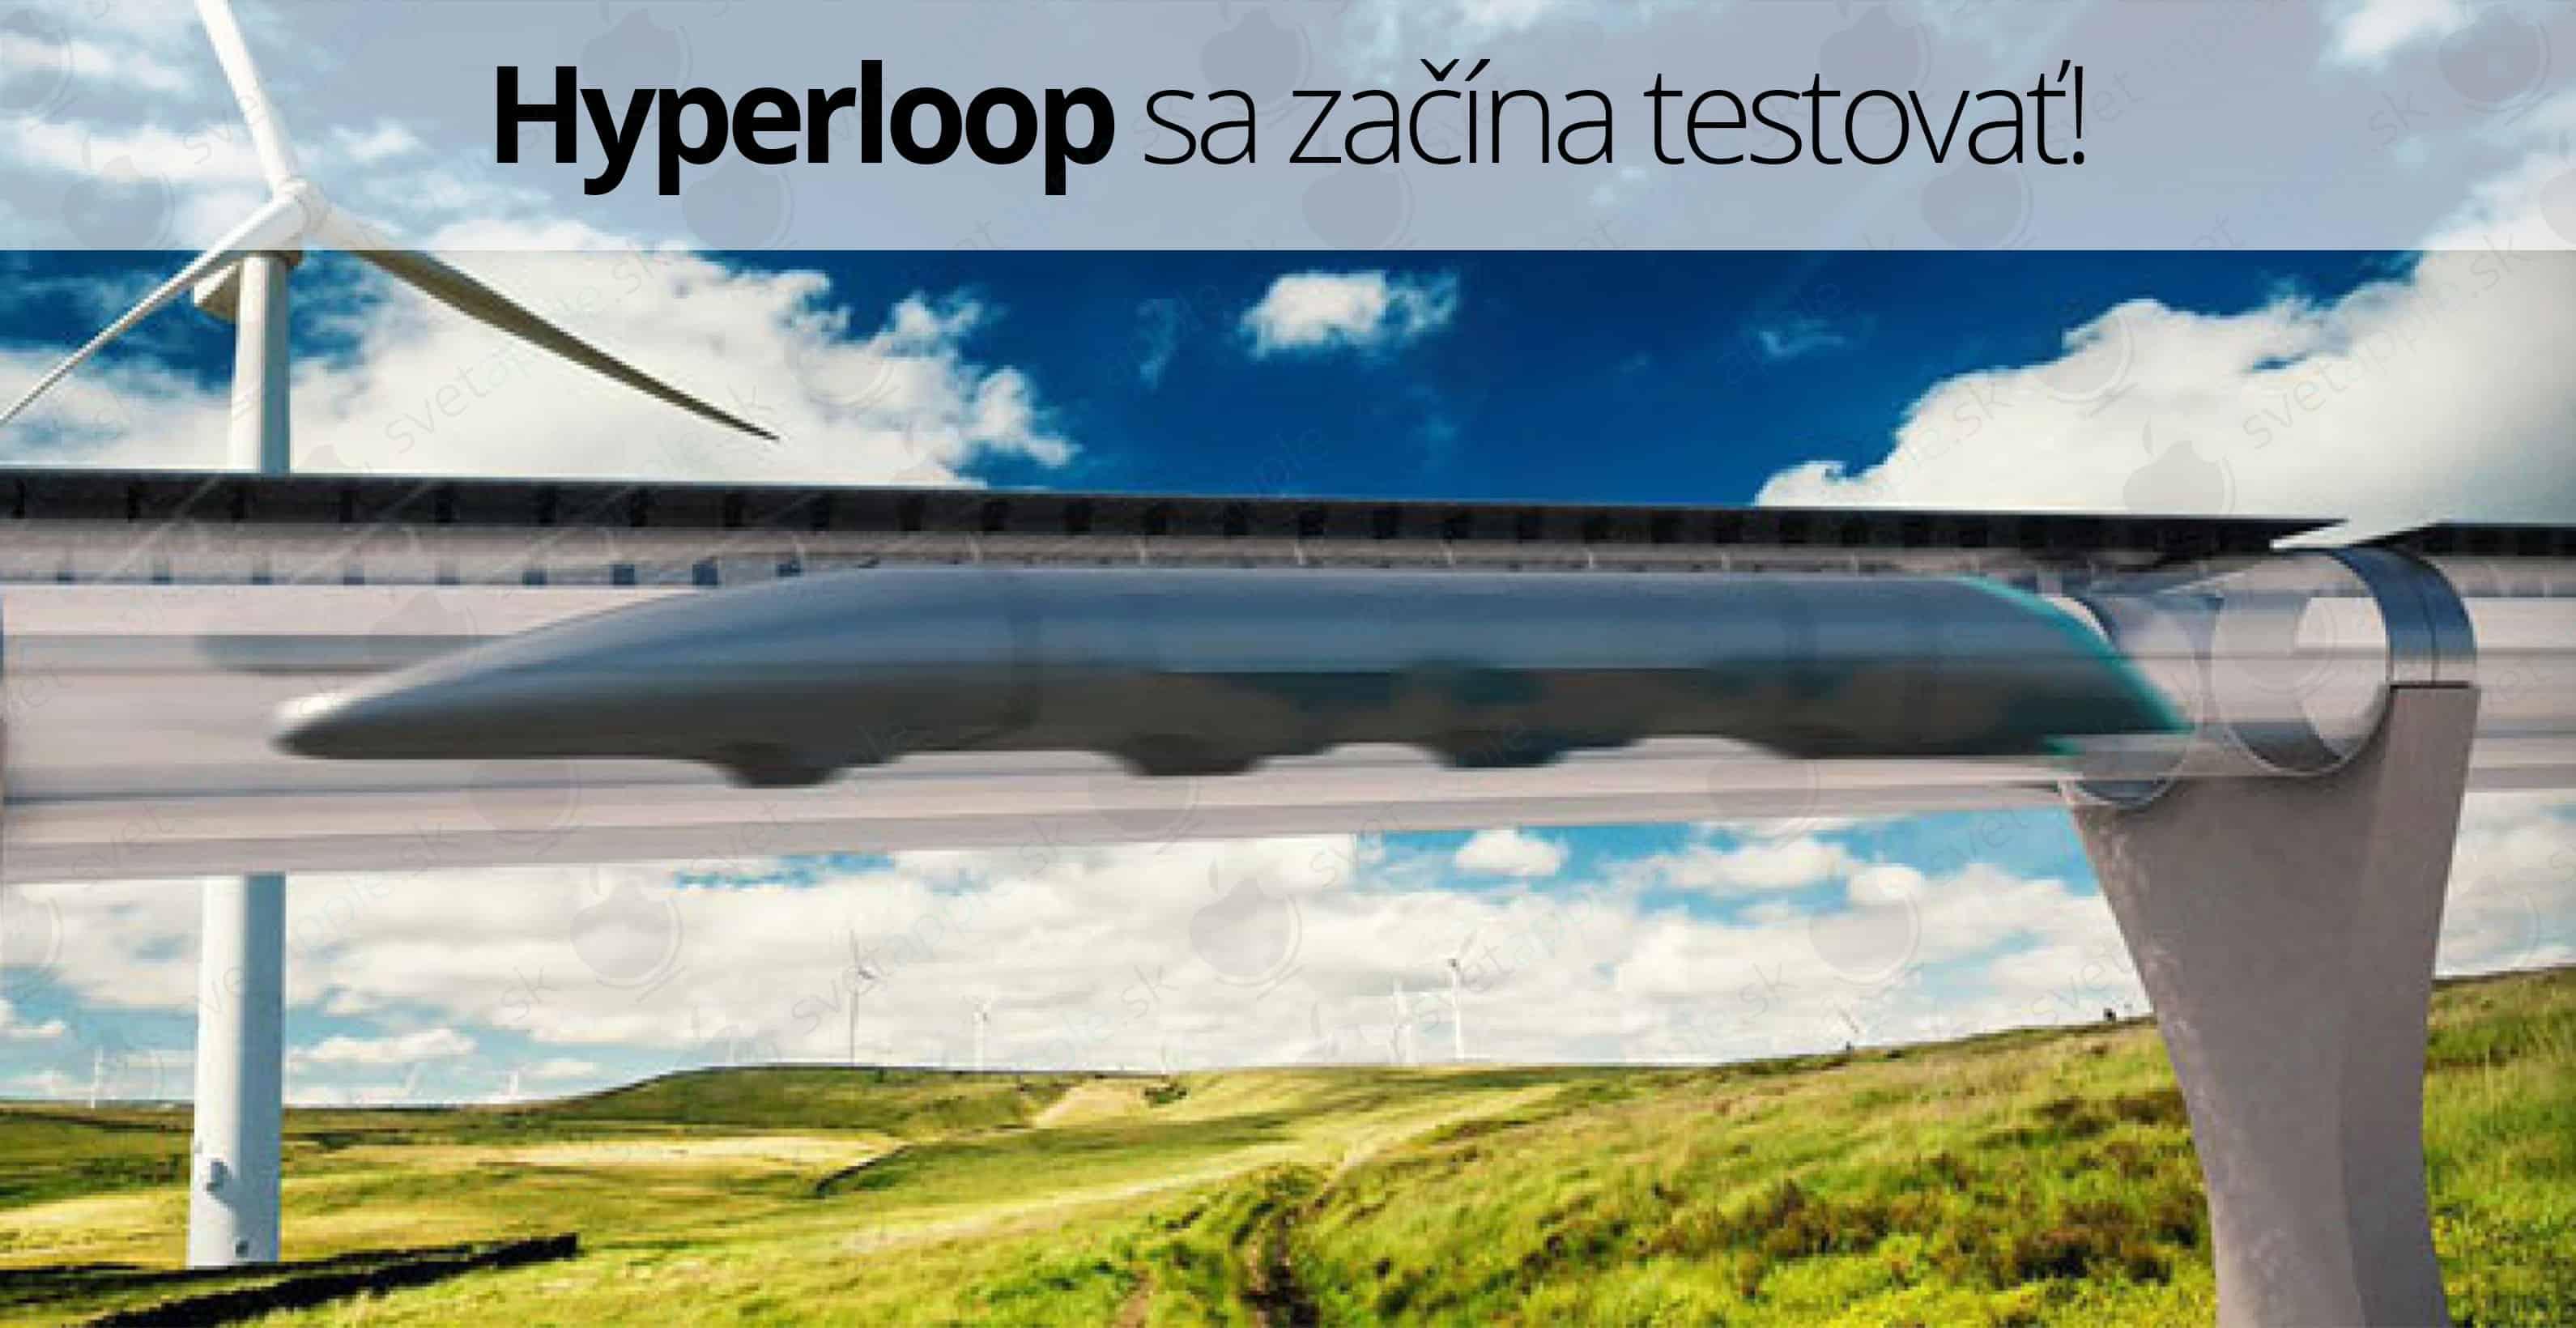 hyperloop-testovanie---titulná-fotografia---SvetApple